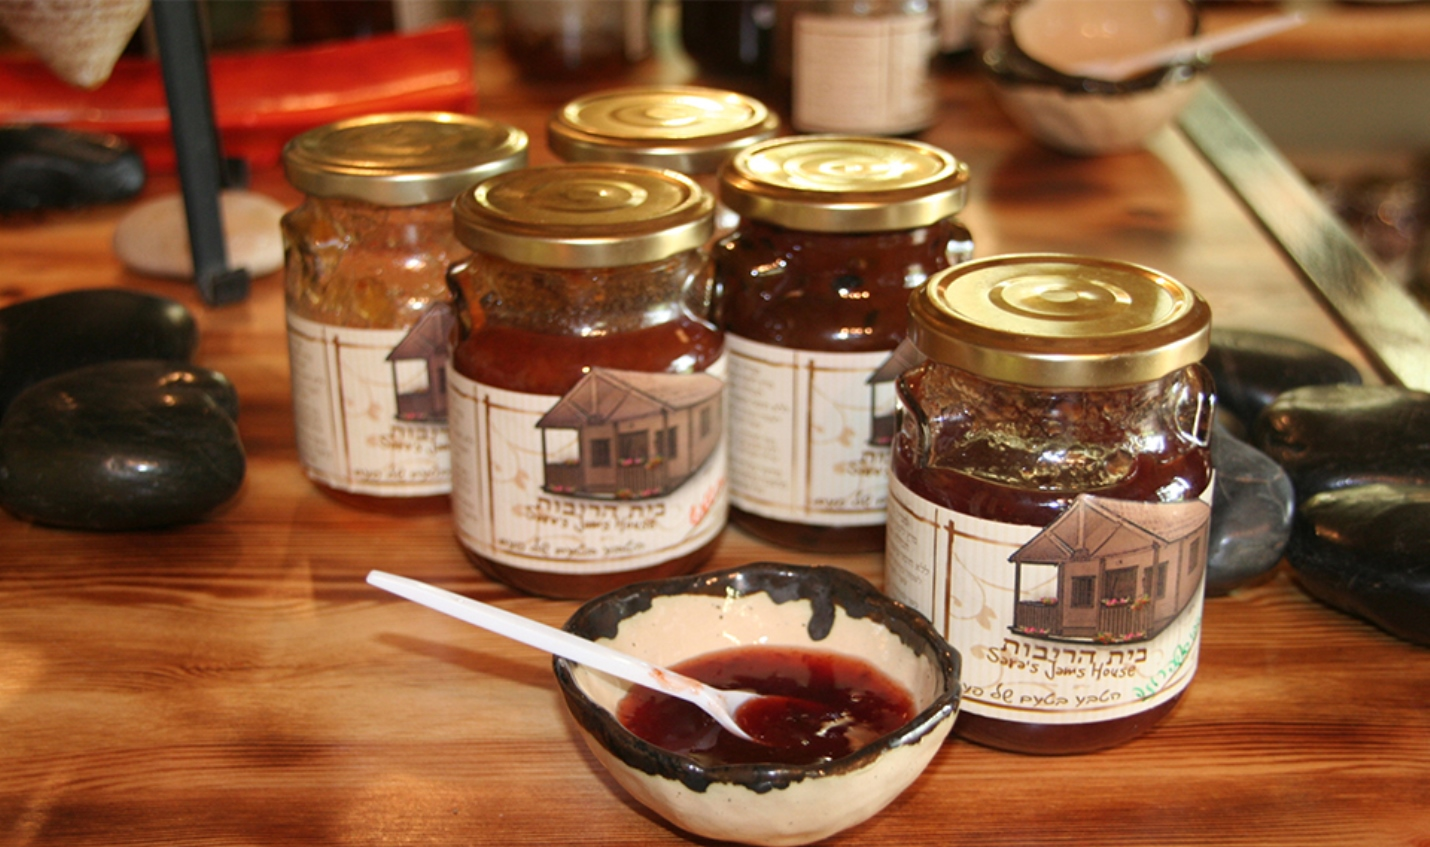 Homemade spreads at Sara's Jam House near Katzrin. Photo: courtesy